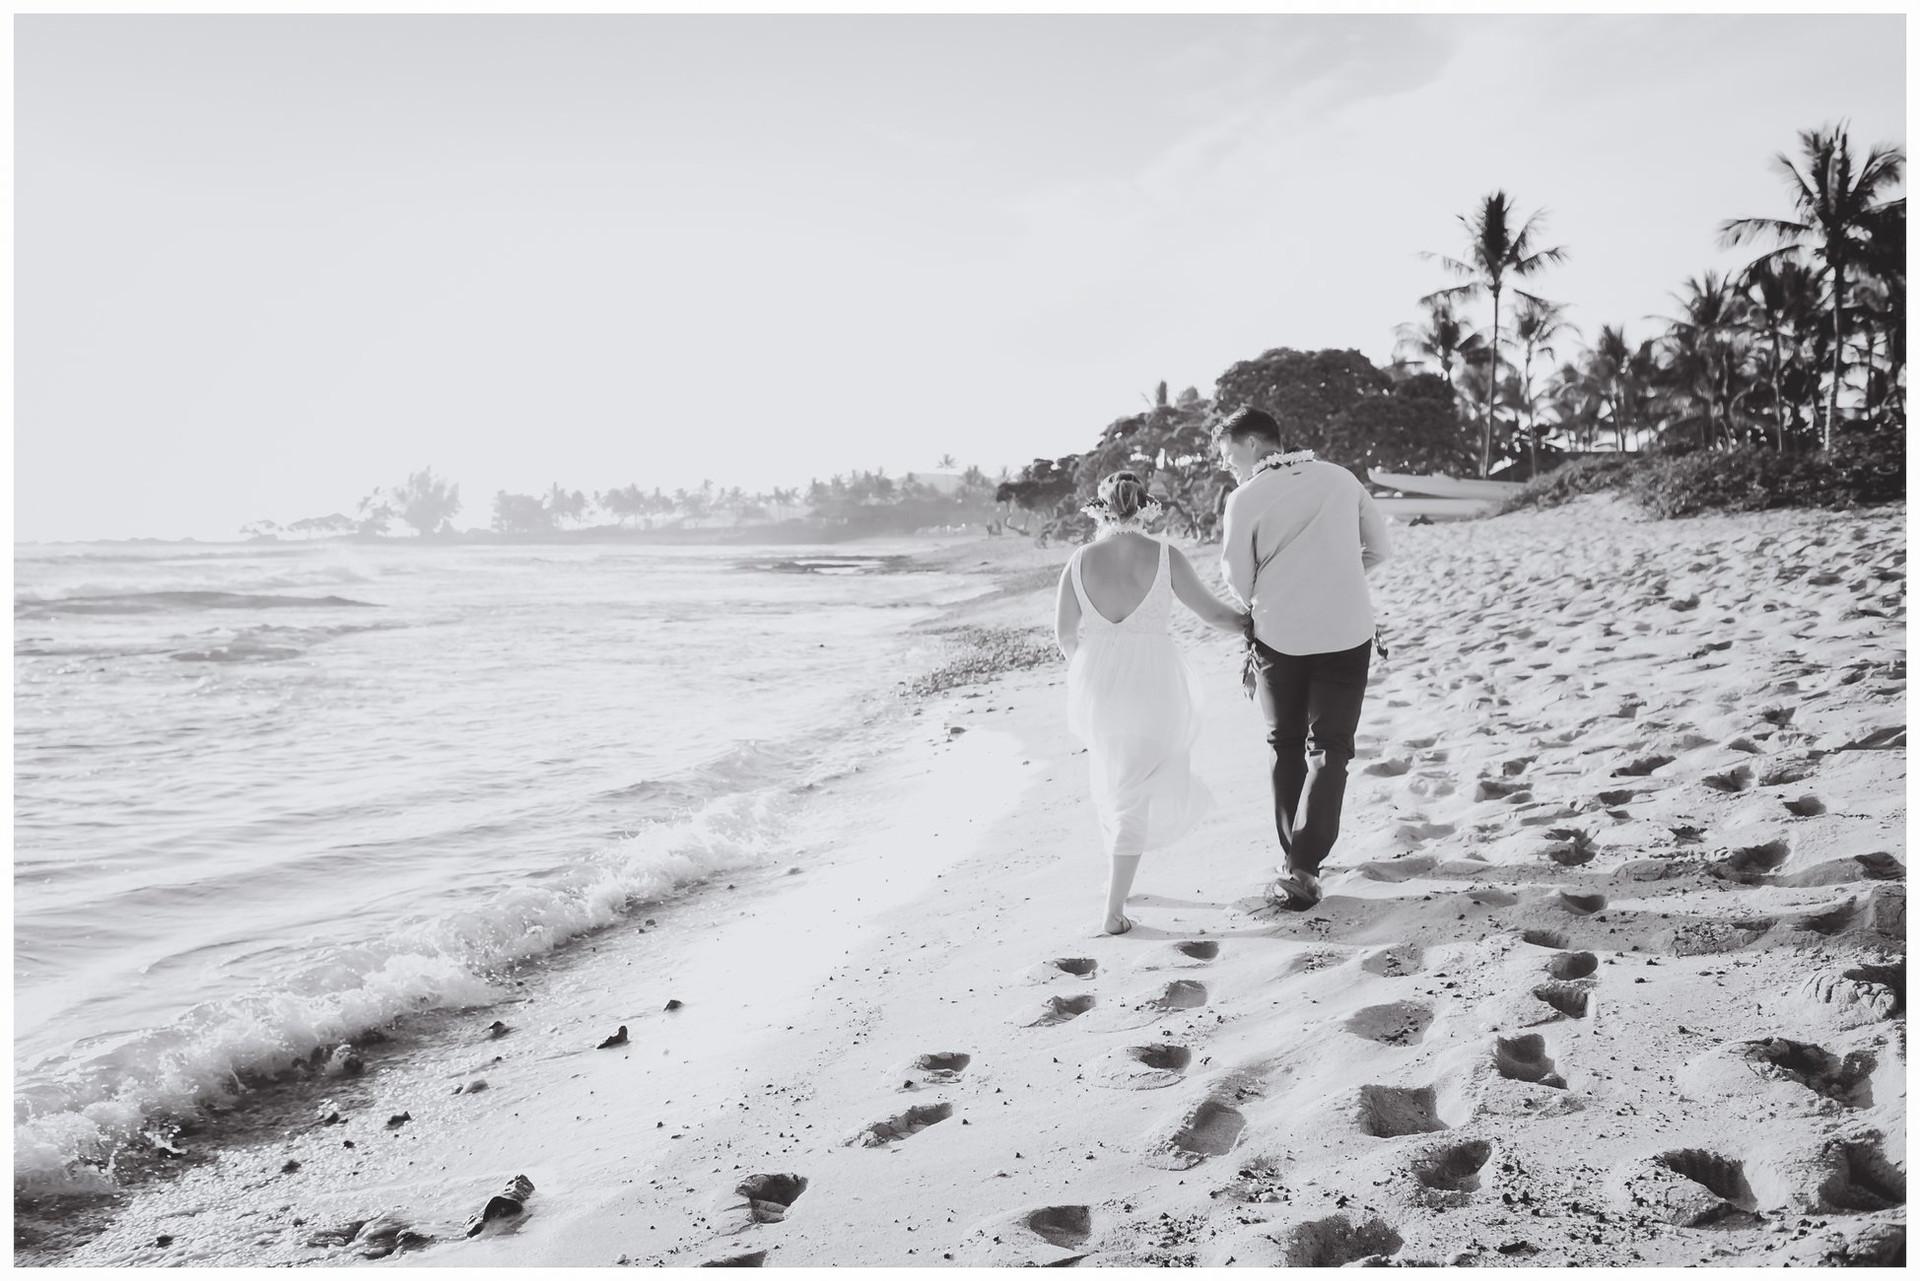 Hawaii Beach Weddings-5-2.jpg